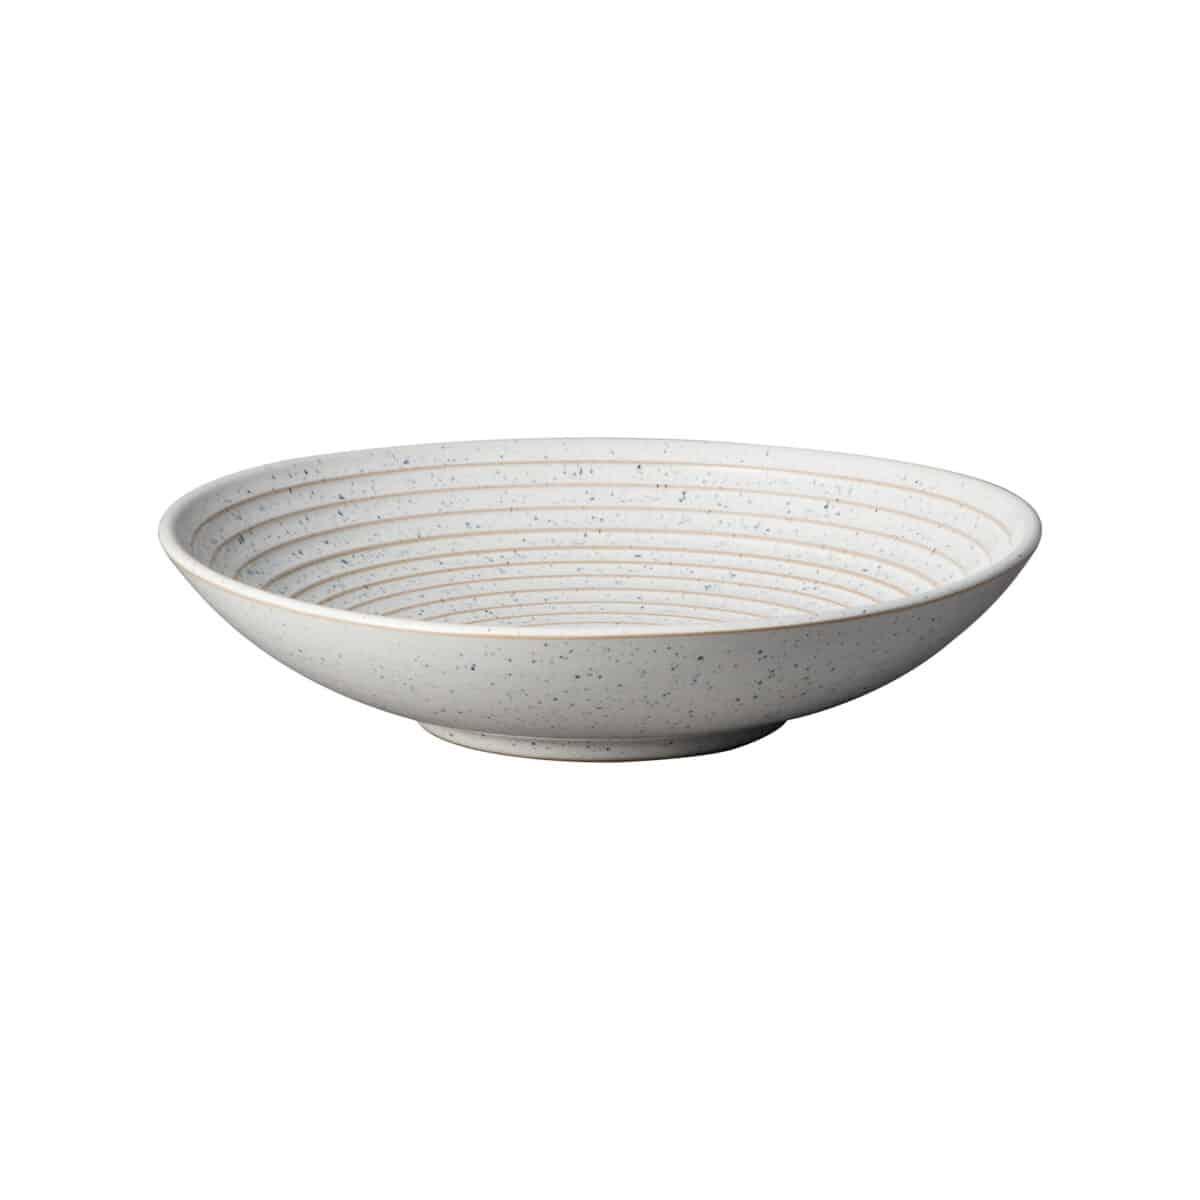 Denby Studio Blue Chalk Ridged Bowl Medium Silver Mushroom